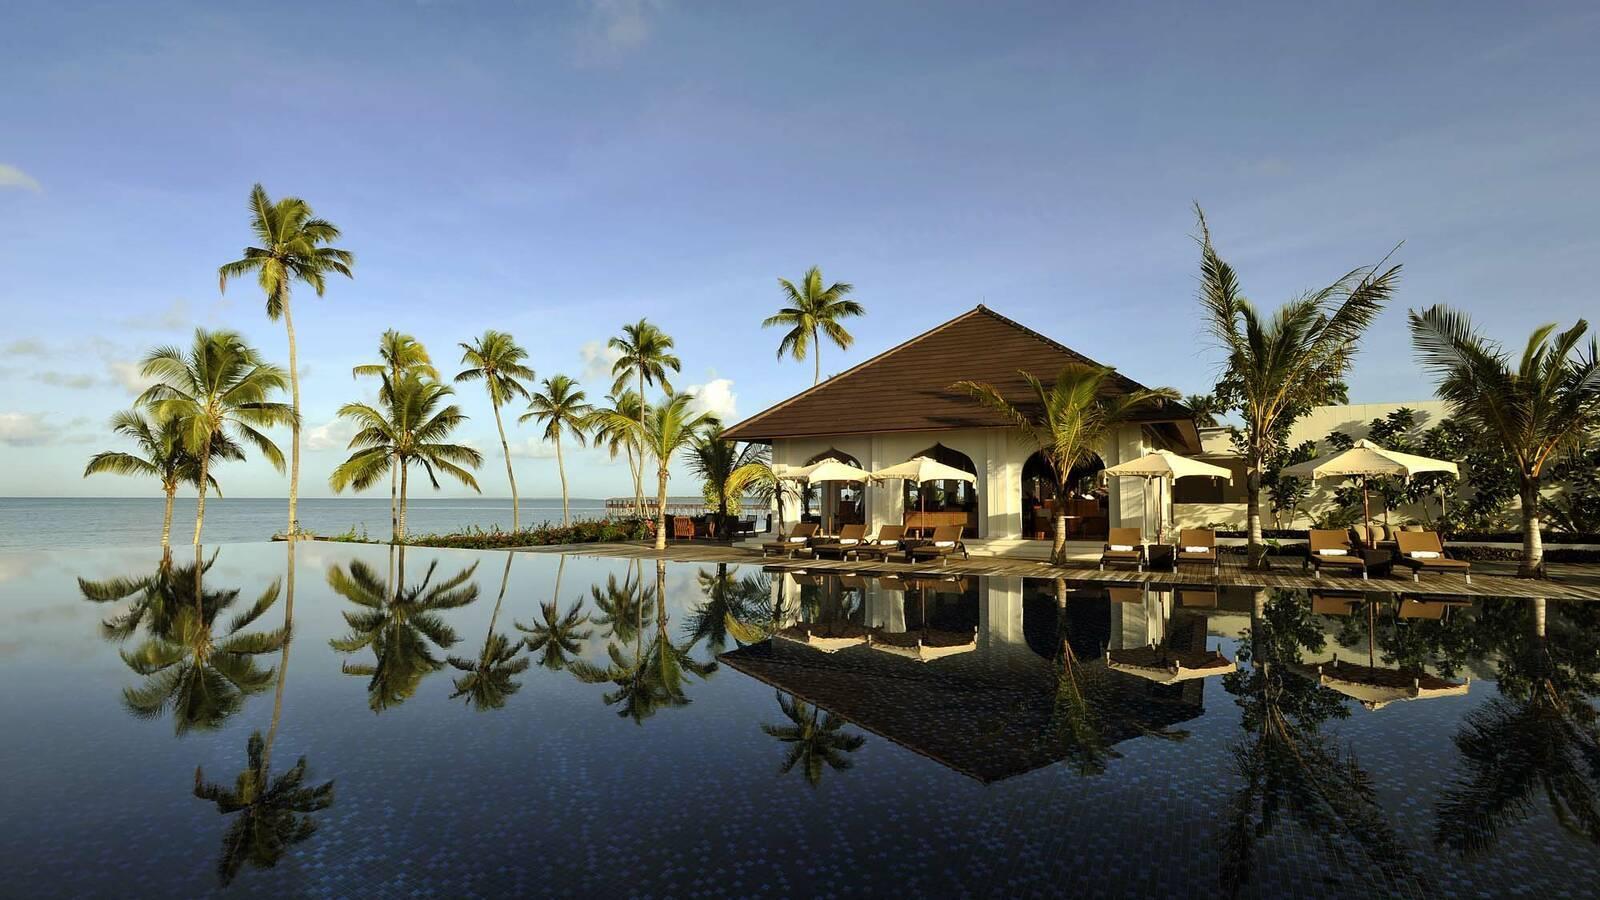 The Residence Piscine Zanzibar